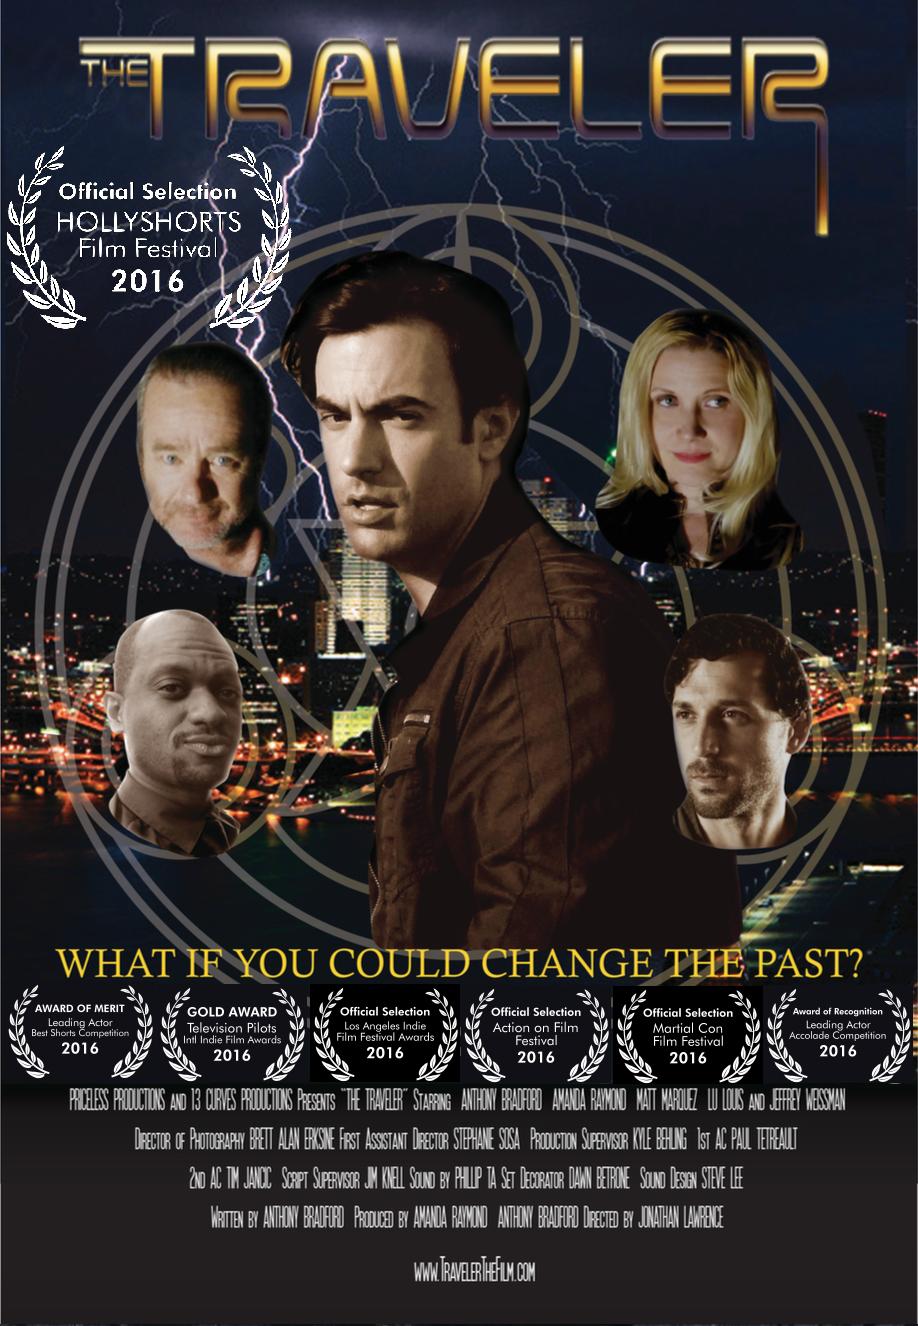 The Traveler poster w- laurels new.png